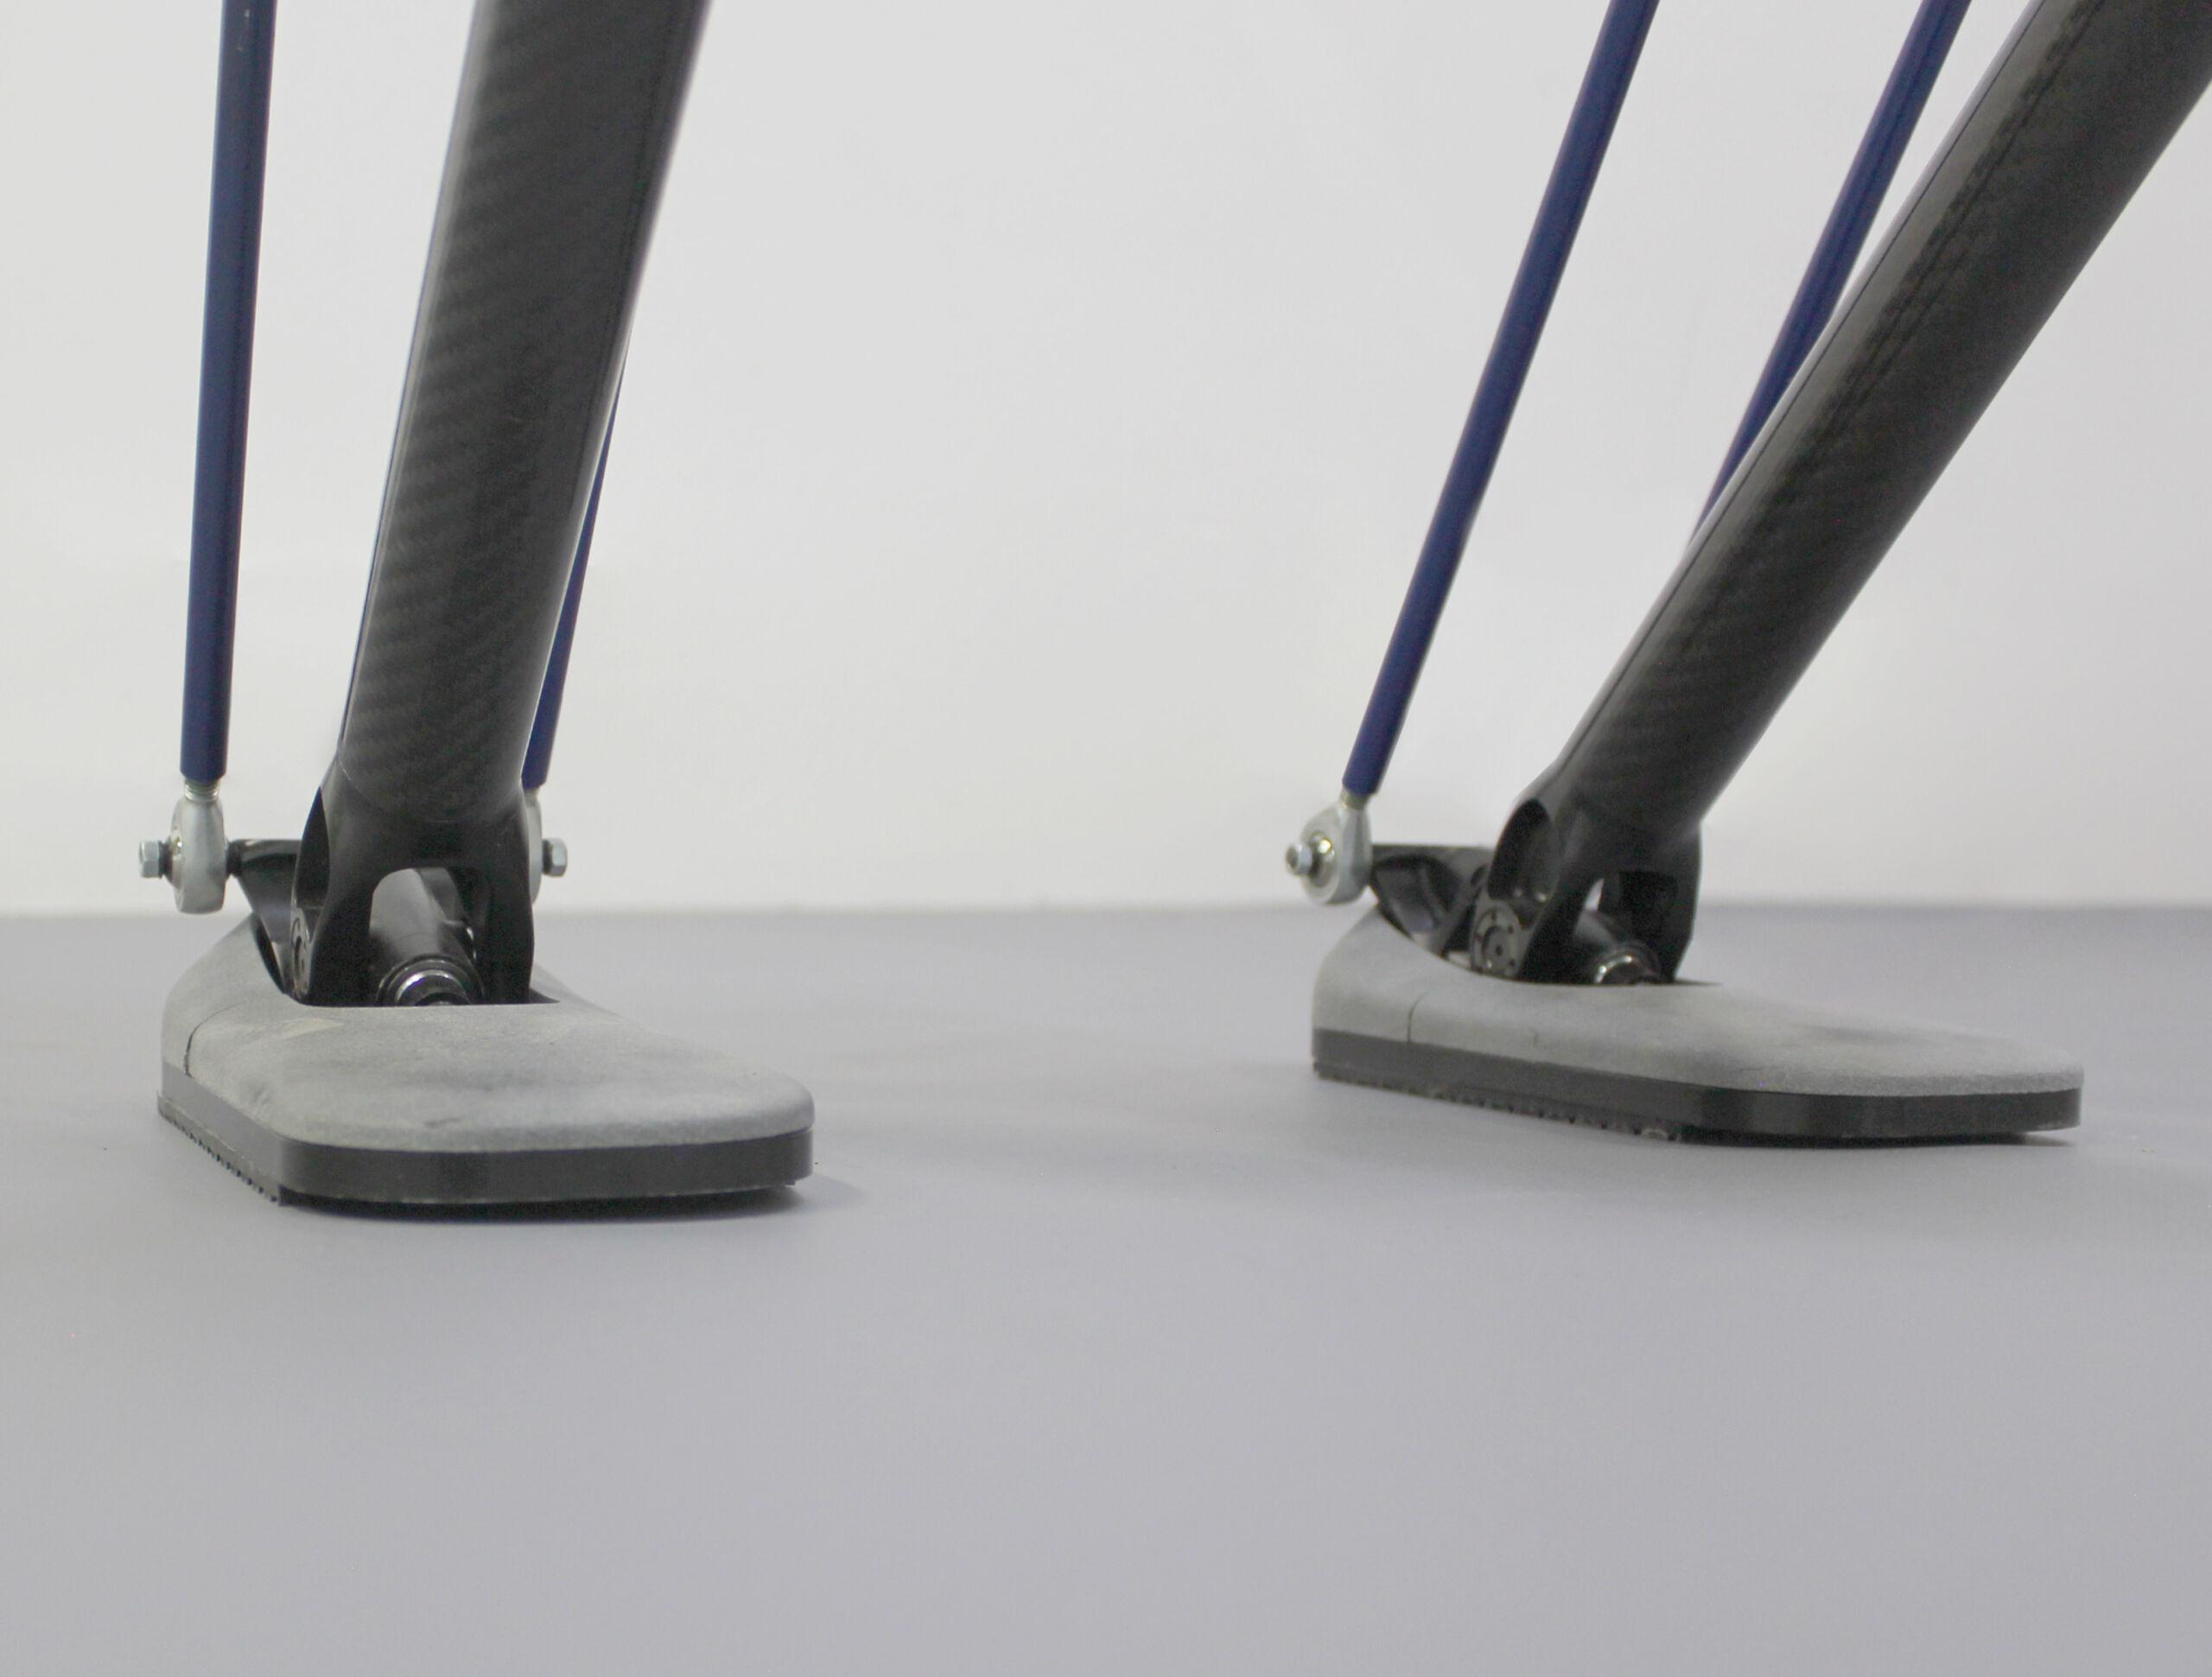 kanagro robot feet by pal robotics